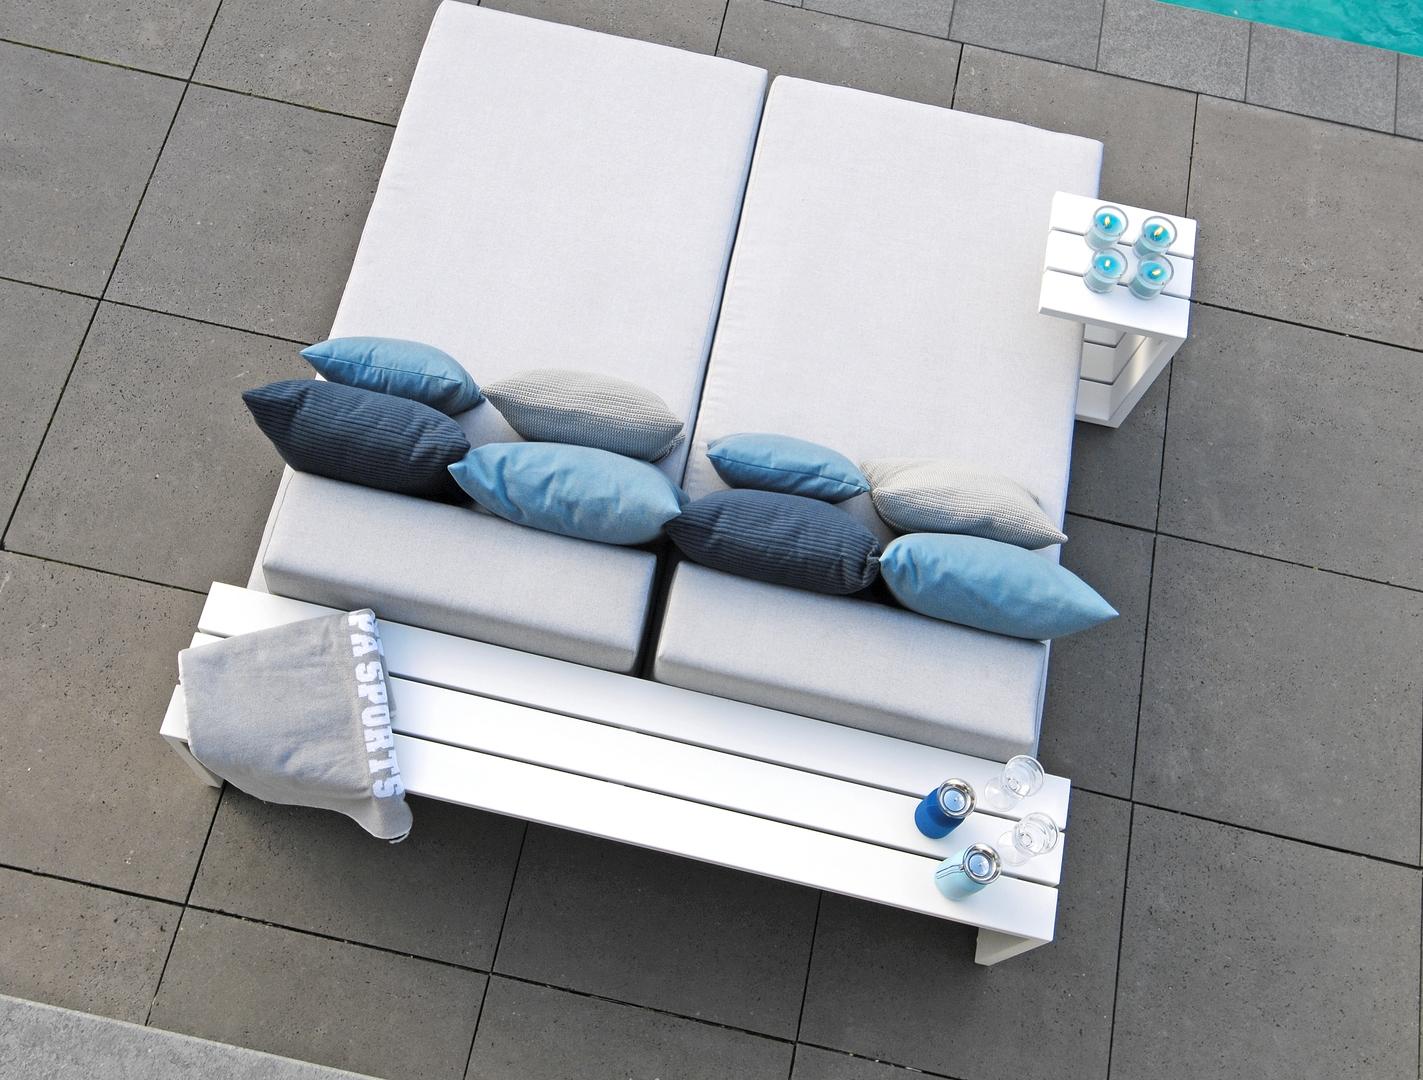 Borek aluminium Samos day-dream side table and coffee table-1.jpg